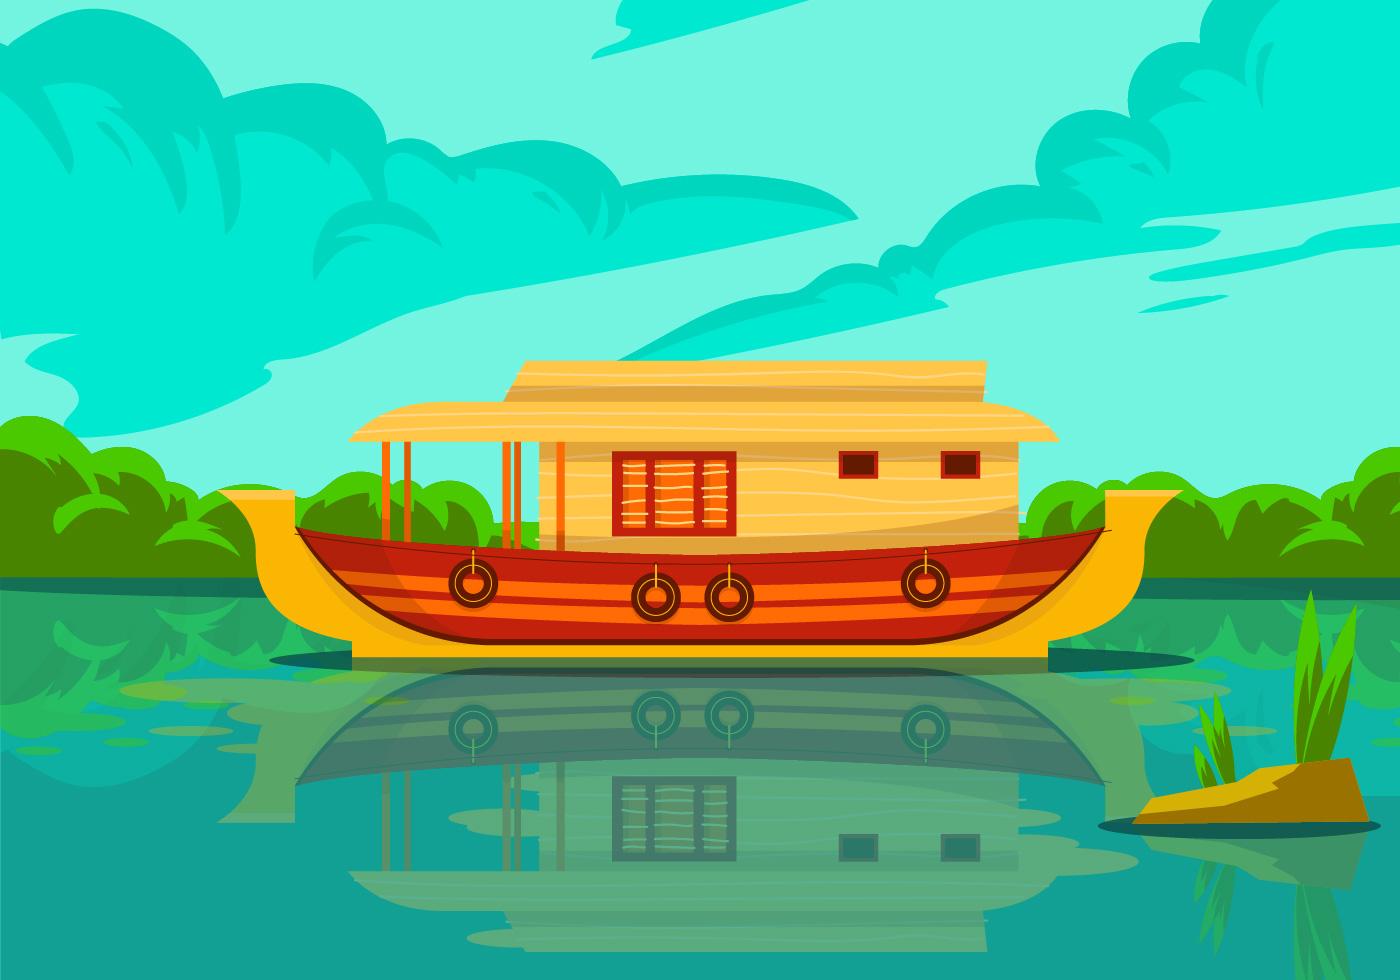 Kerala Hausboot Vektor Hintergrund Illustration - Kostenlose Vektor-Kunst Archiv-Grafiken ...